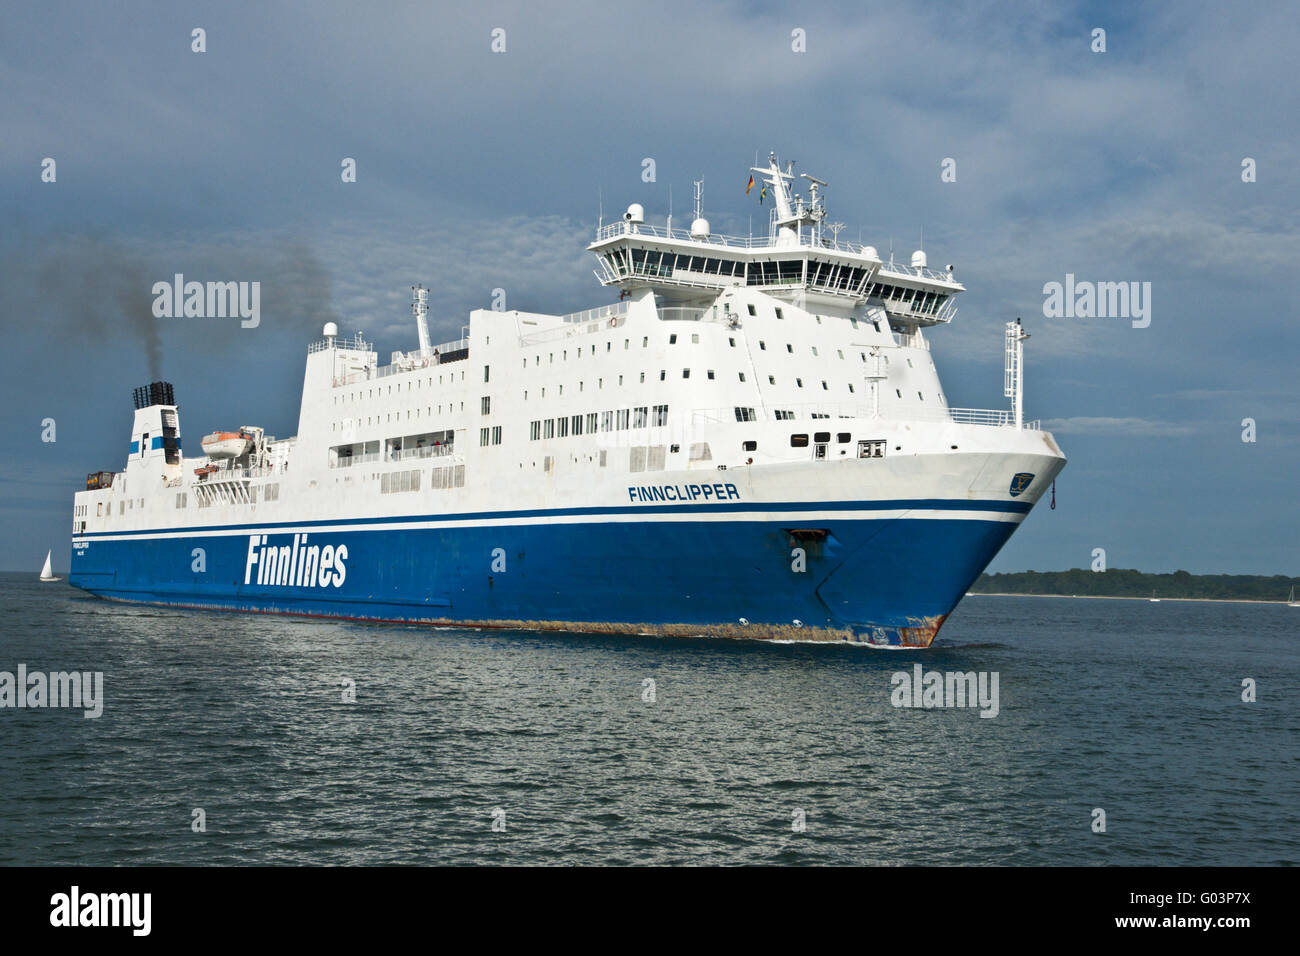 Ferry Finnlines - Stock Image